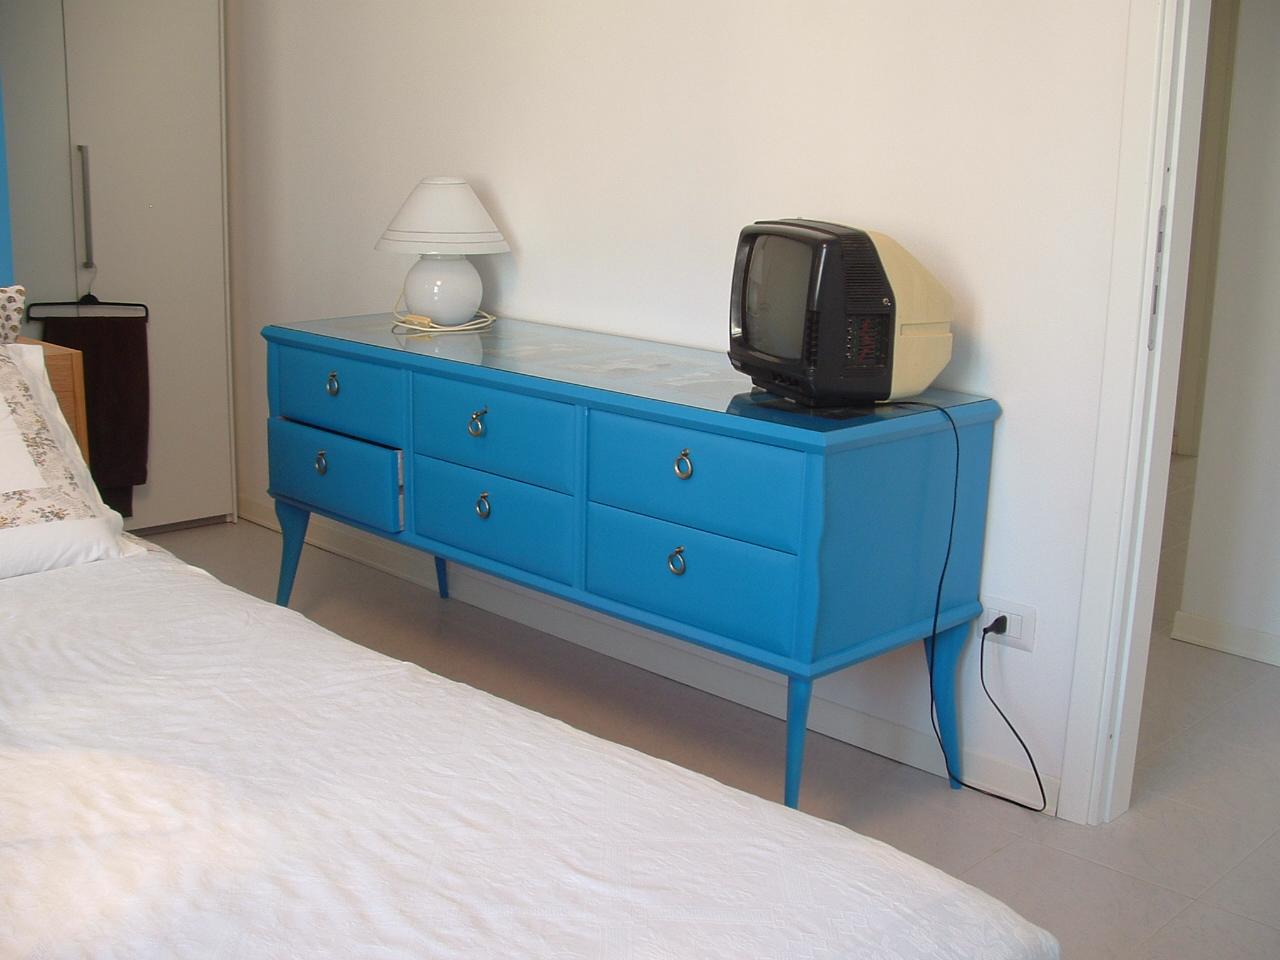 Dipingere mobili vecchi xw84 regardsdefemmes - Colorare i mobili ...